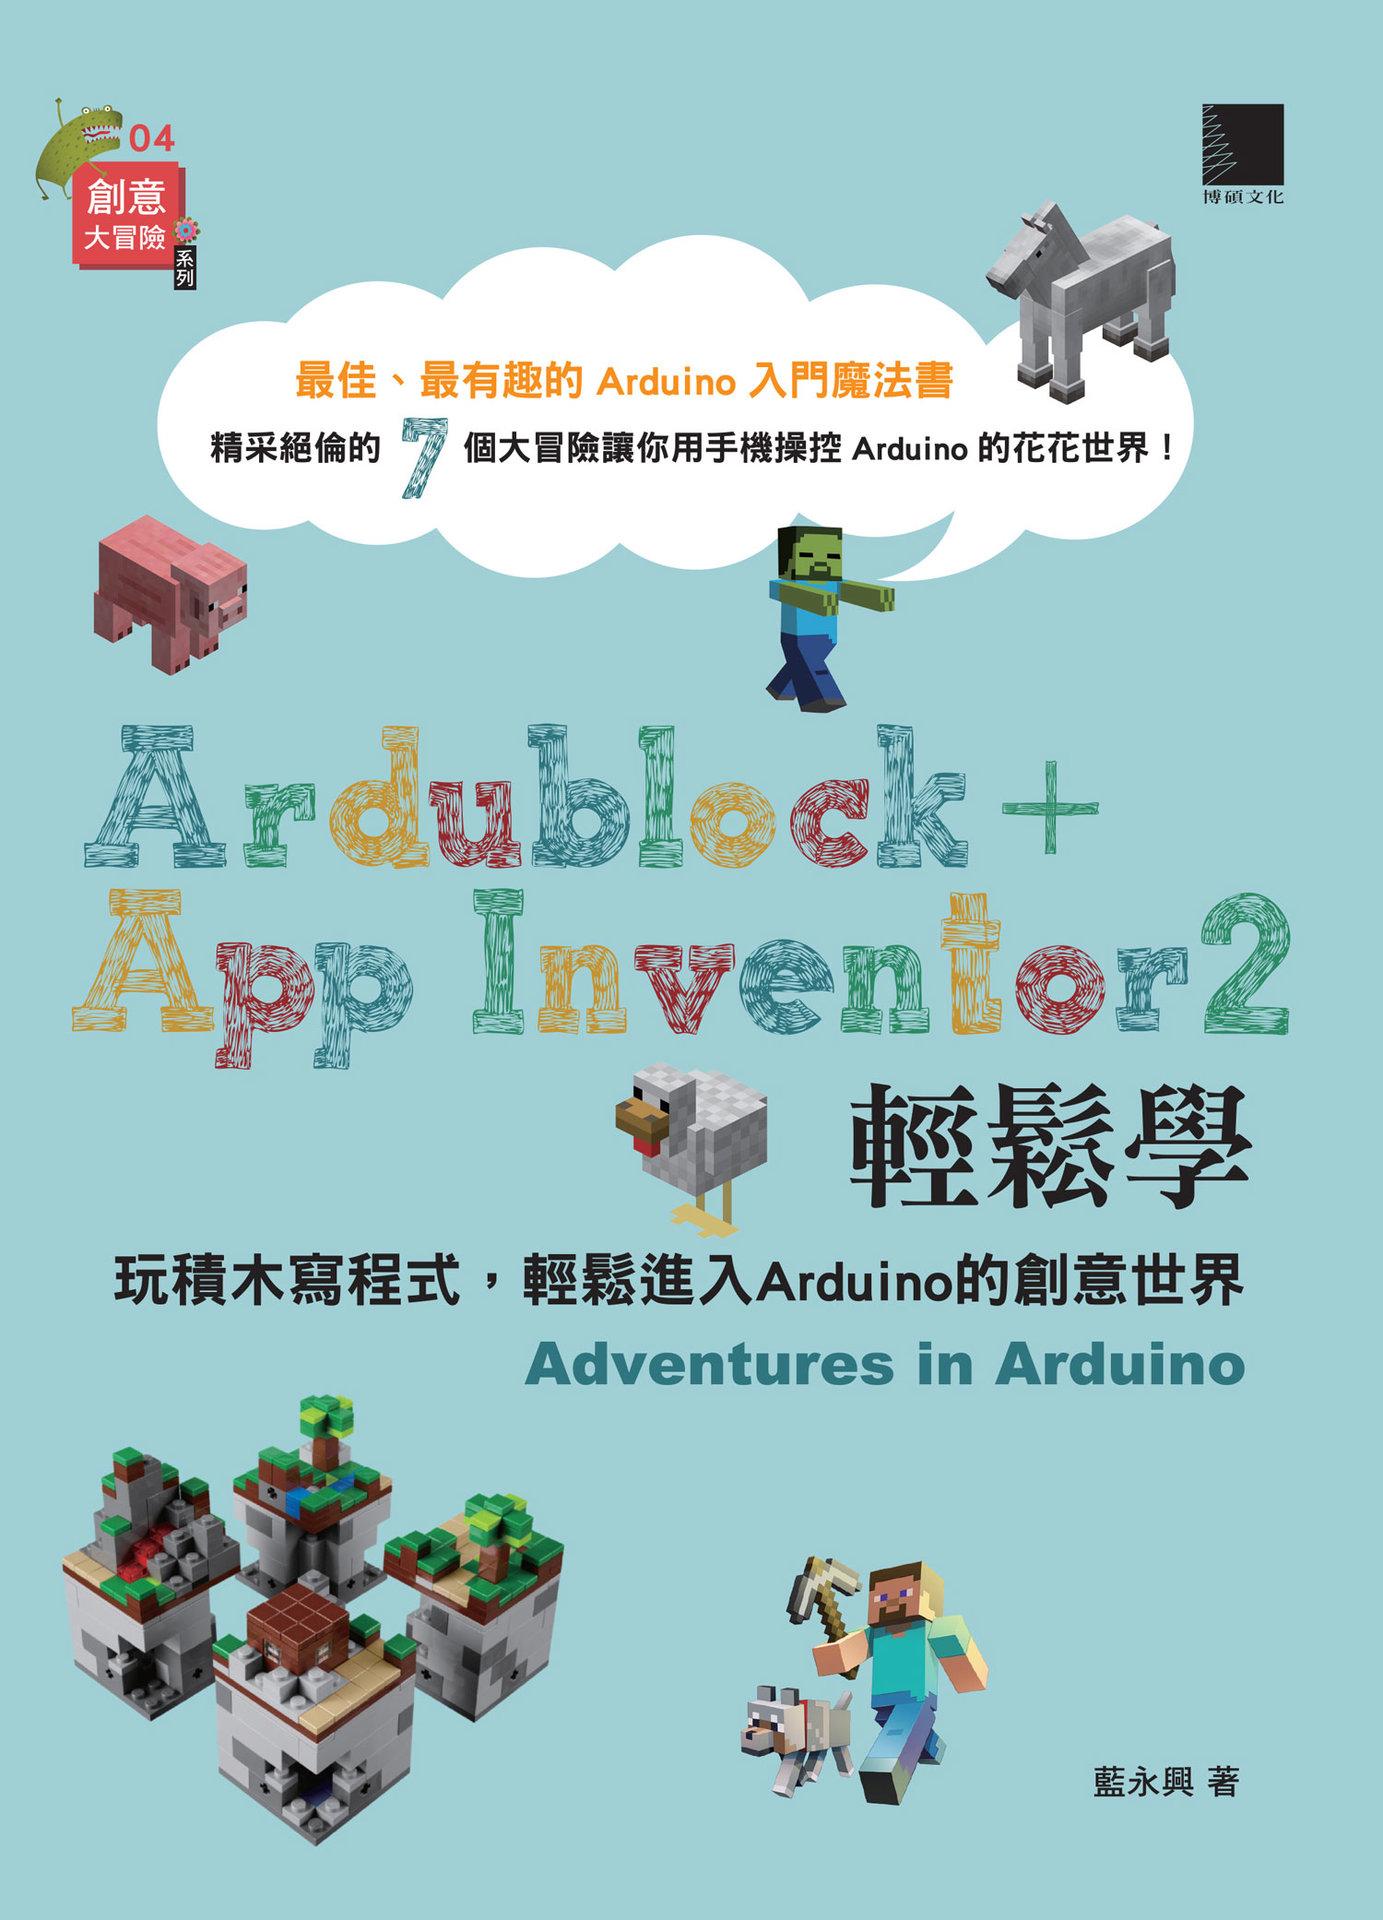 Ardublock + App Inventor 2 輕鬆學:玩積木寫程式,輕鬆進入 Arduino 的創意世界-preview-1